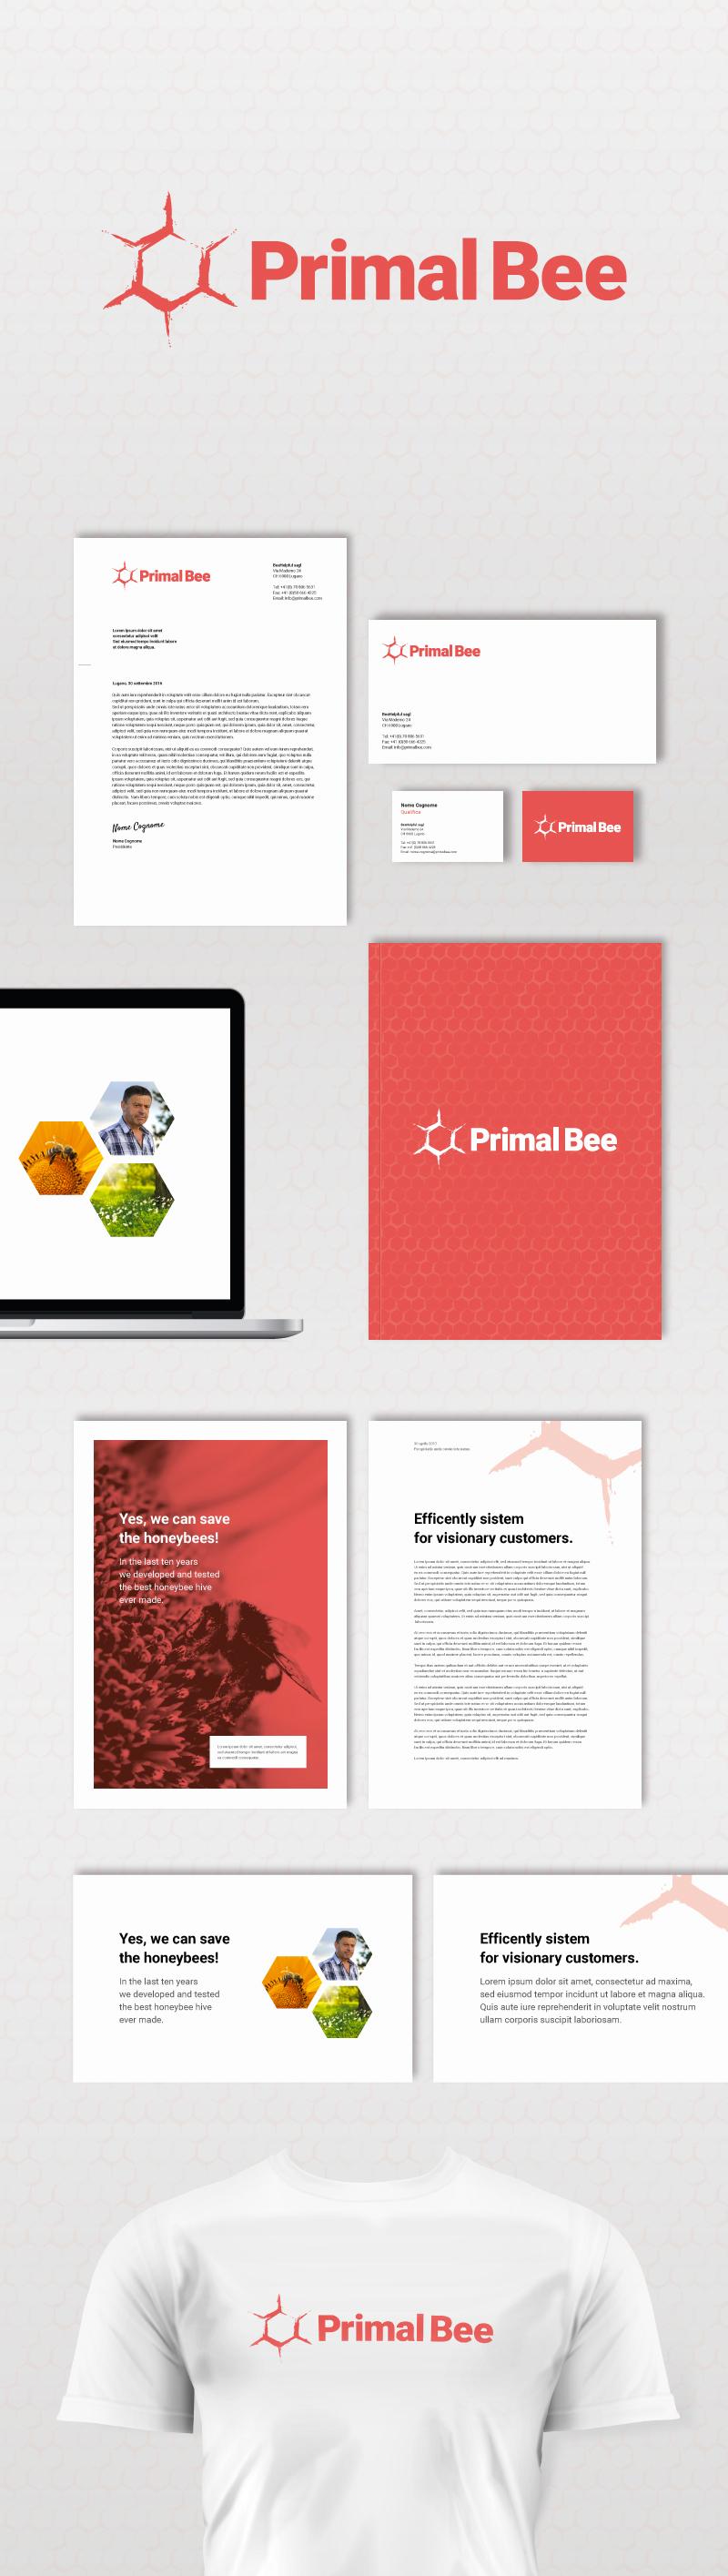 Primal Bee brand identity